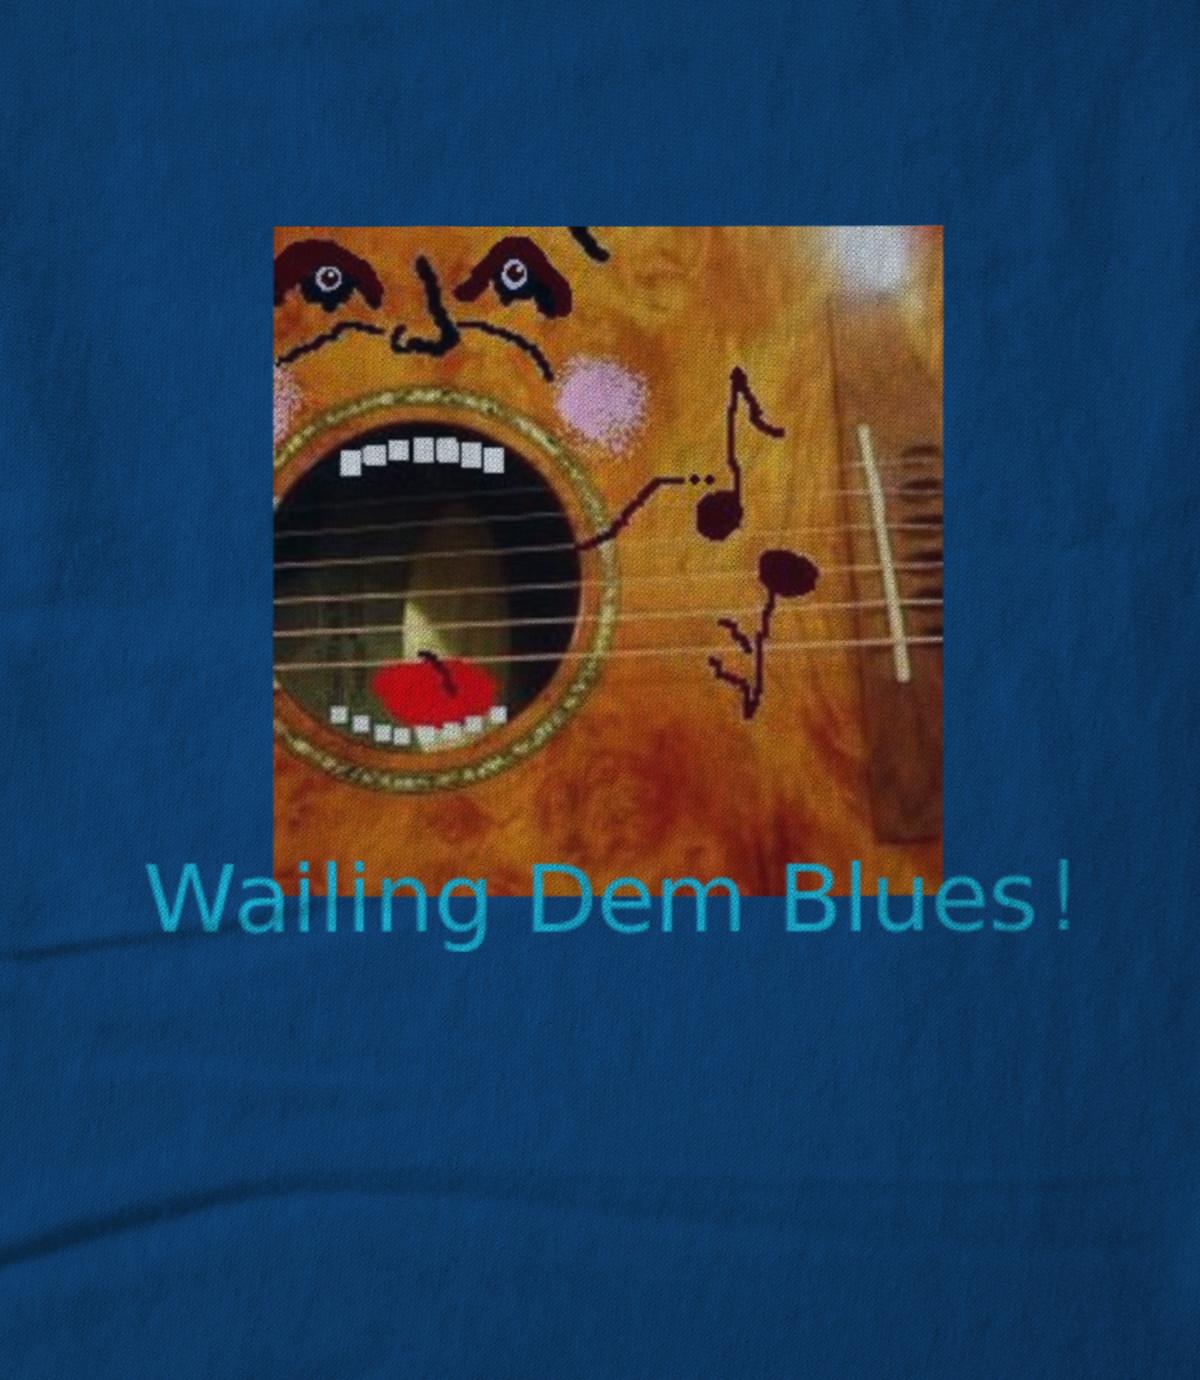 Matthew f  blowers iii wailing dem blues   1505323805